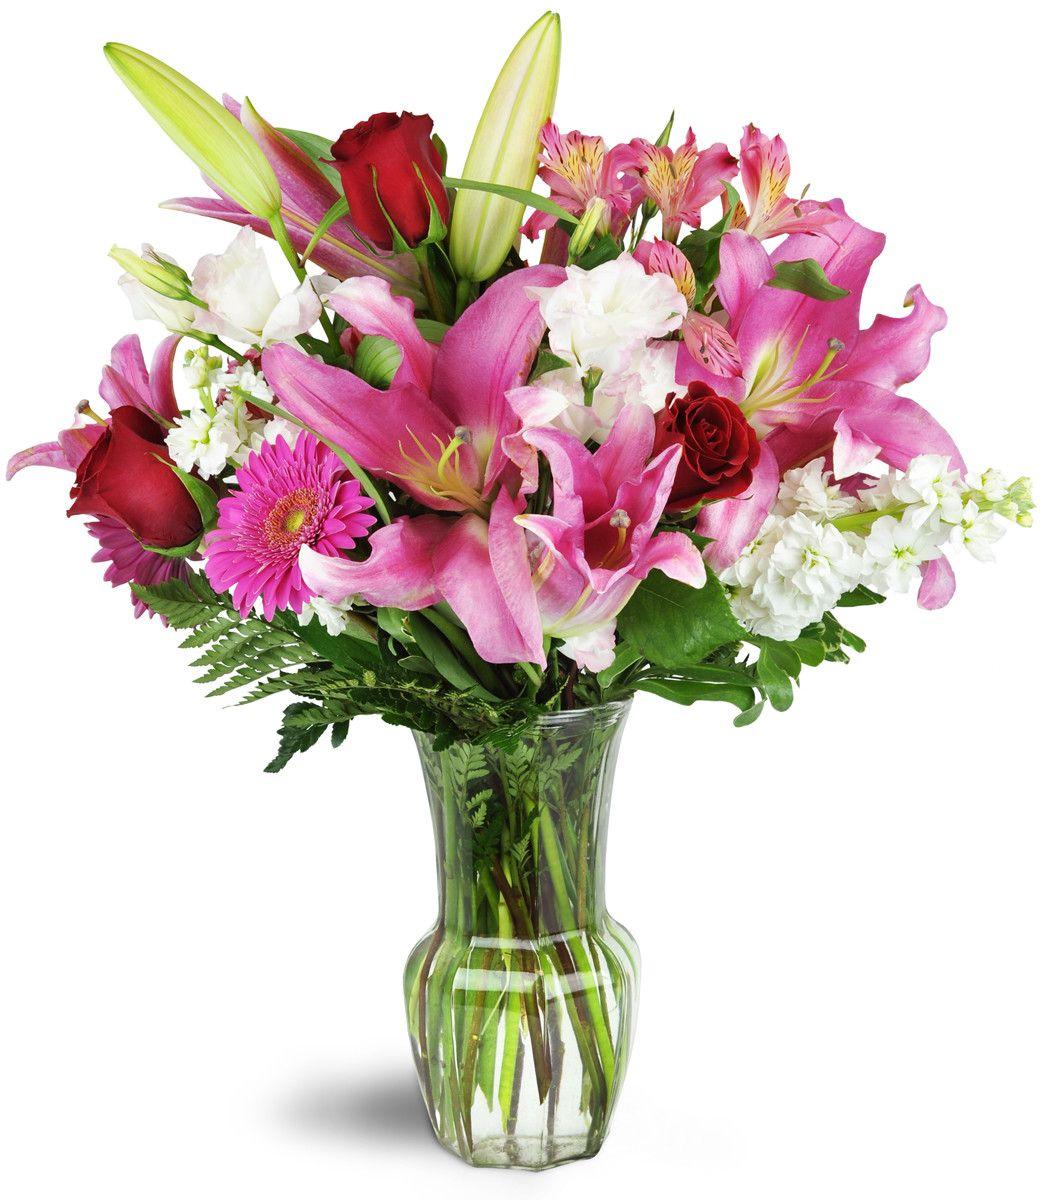 Blushing Heart Bouquet™ Hot pink gerbera daisies, red